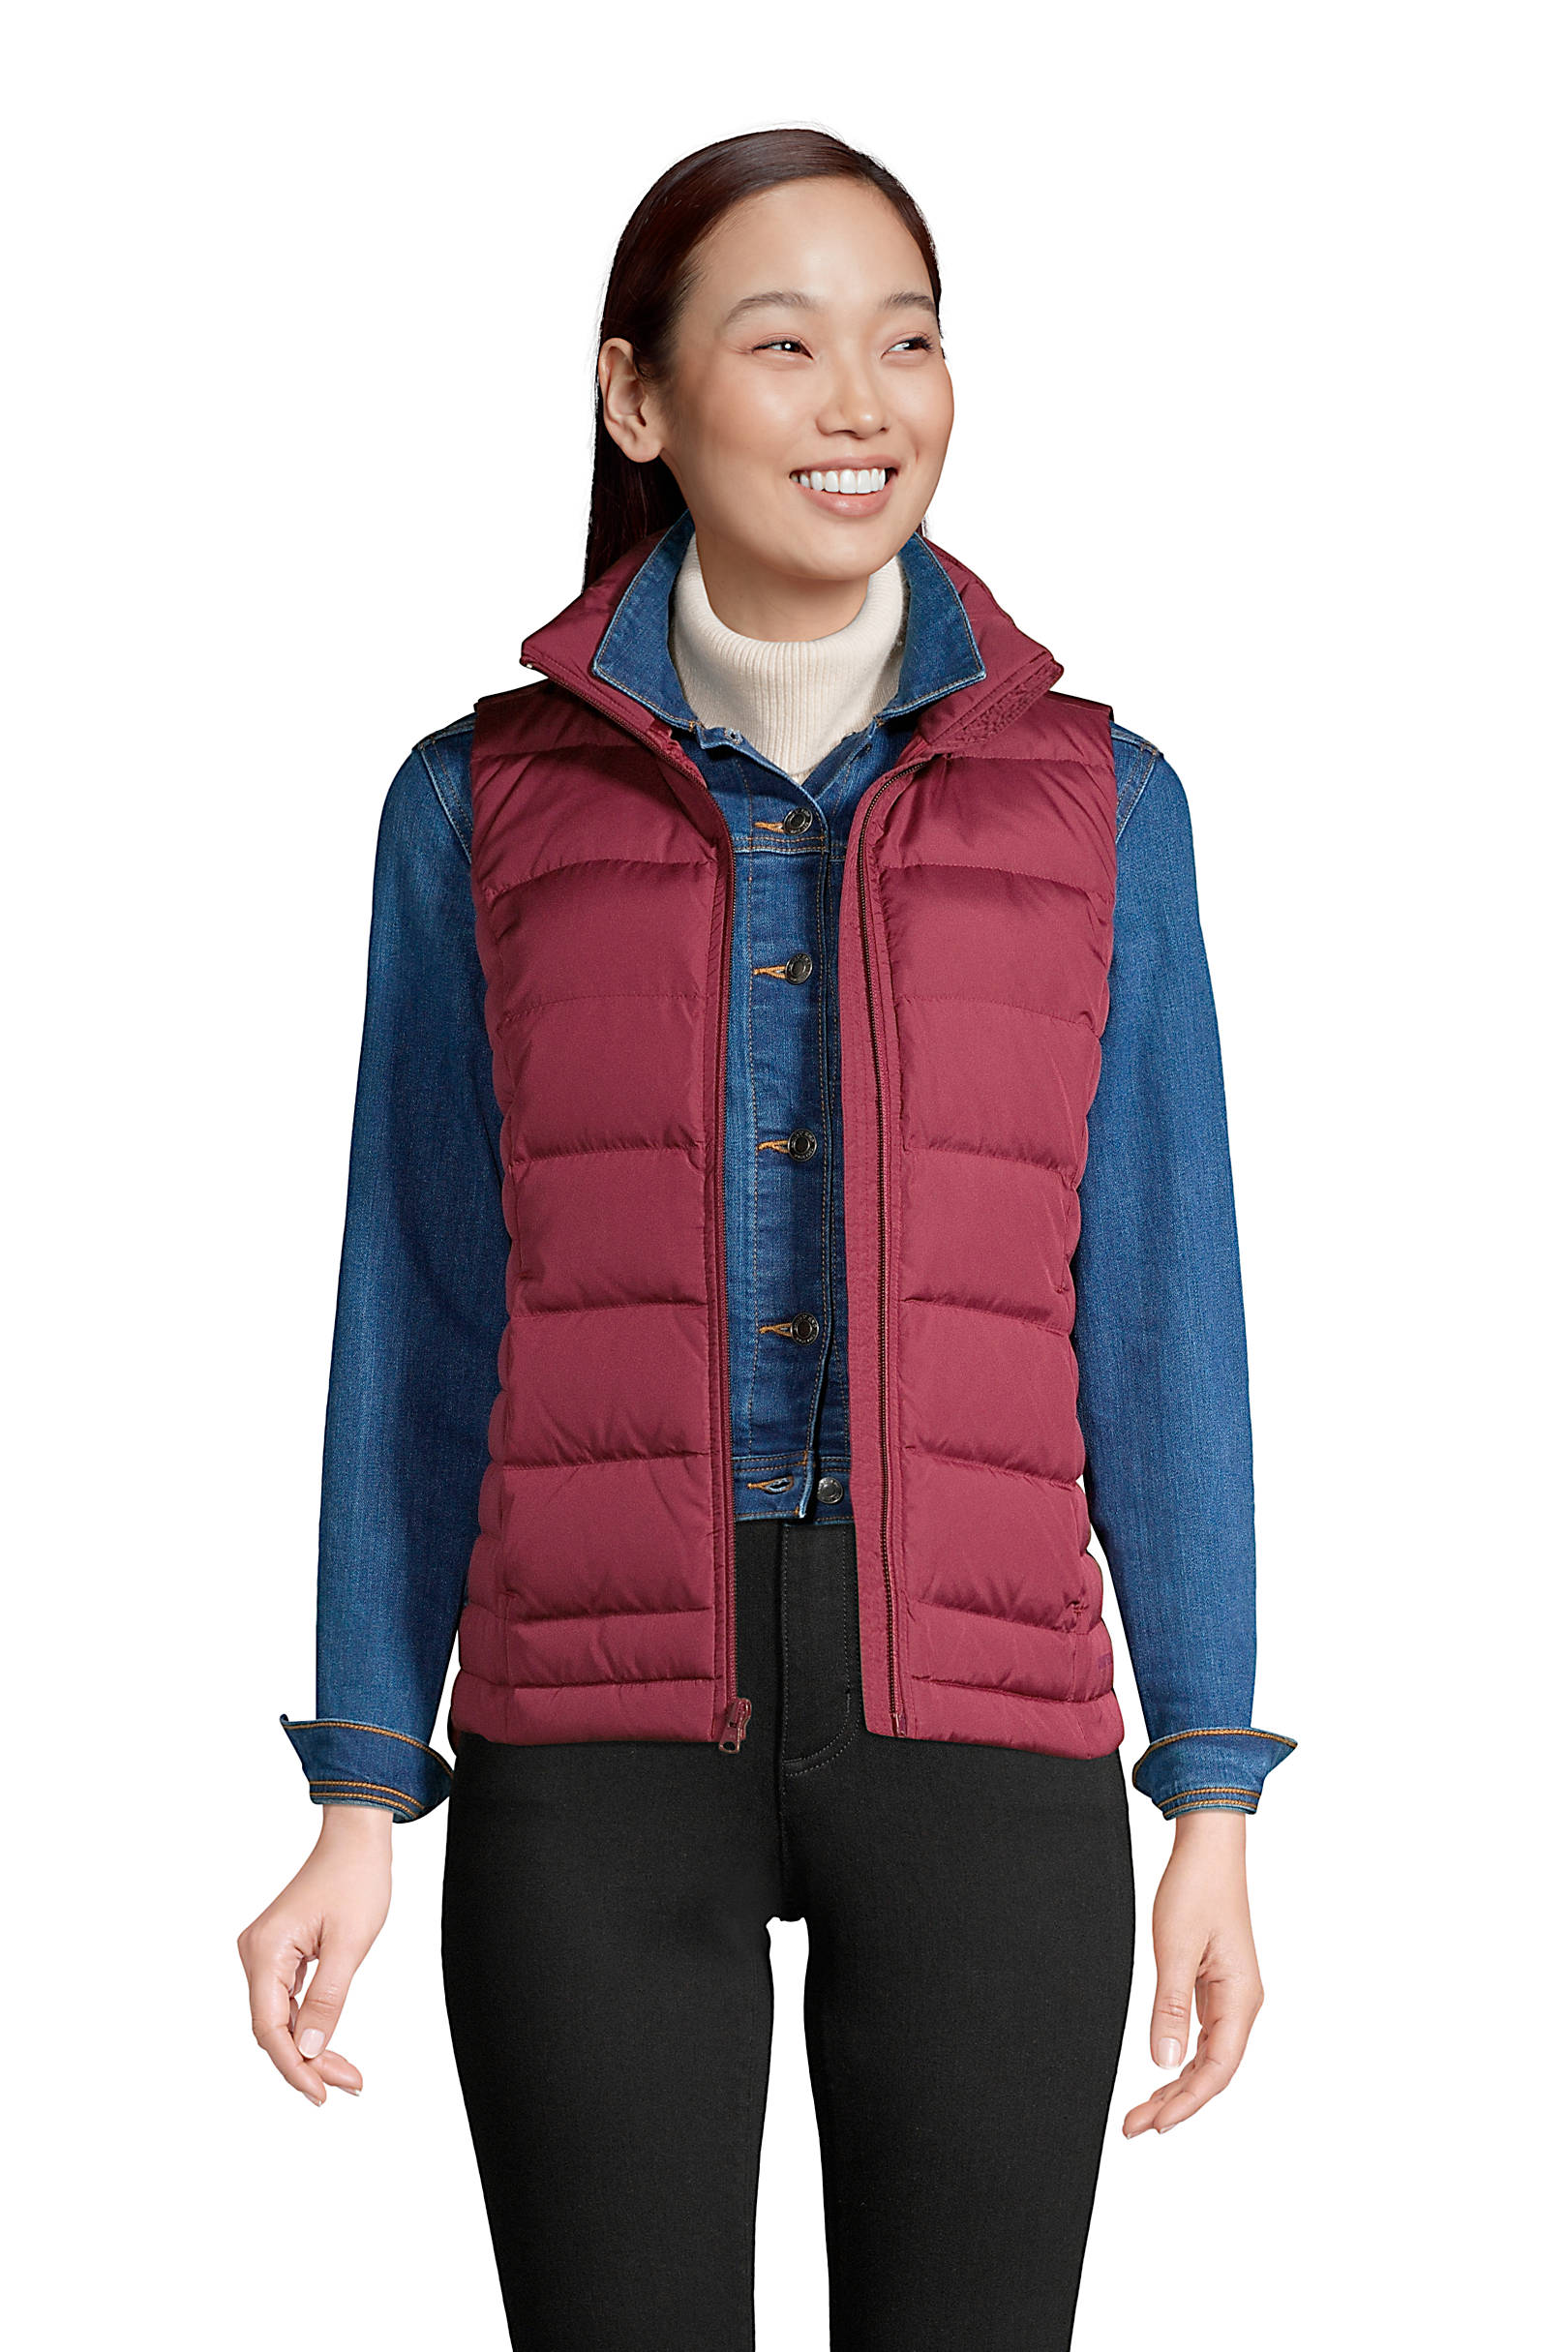 Women's Down Winter Puffer Vest $19.98